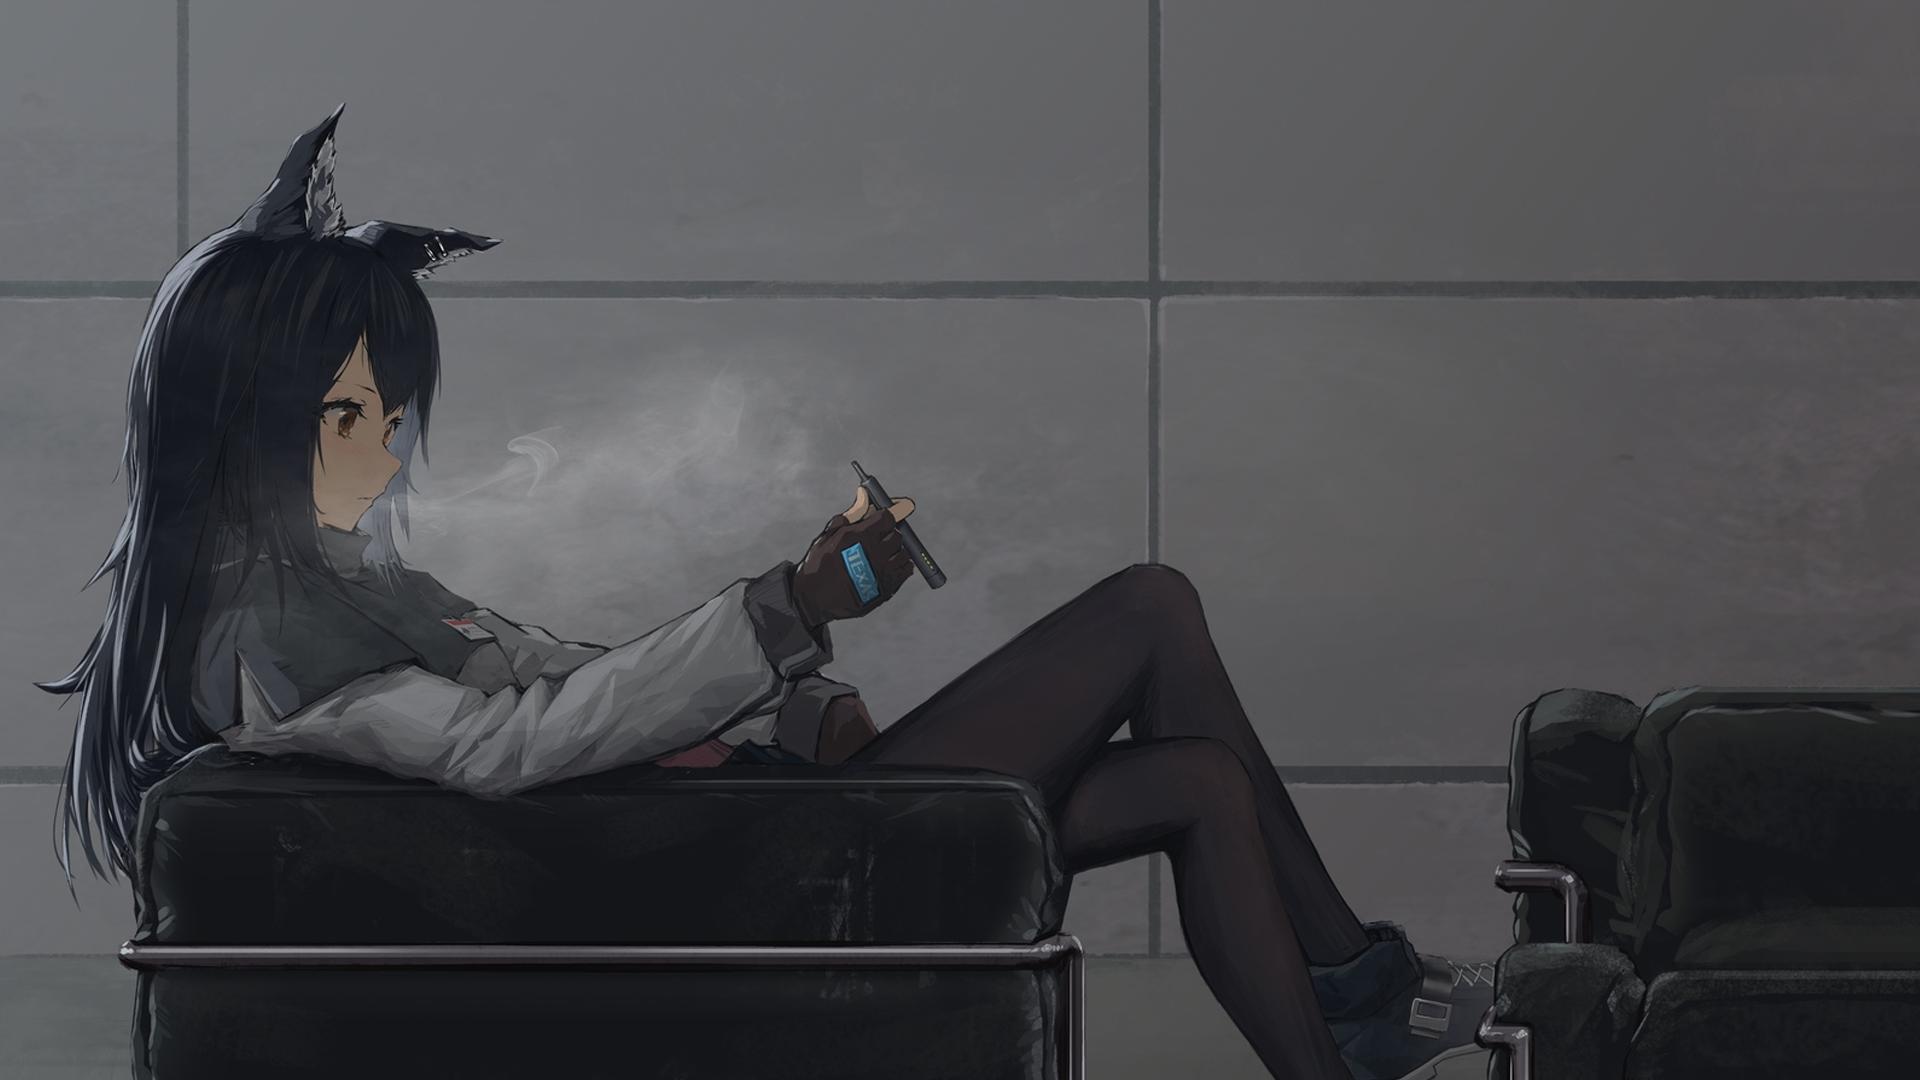 курящие тян картинки праздник